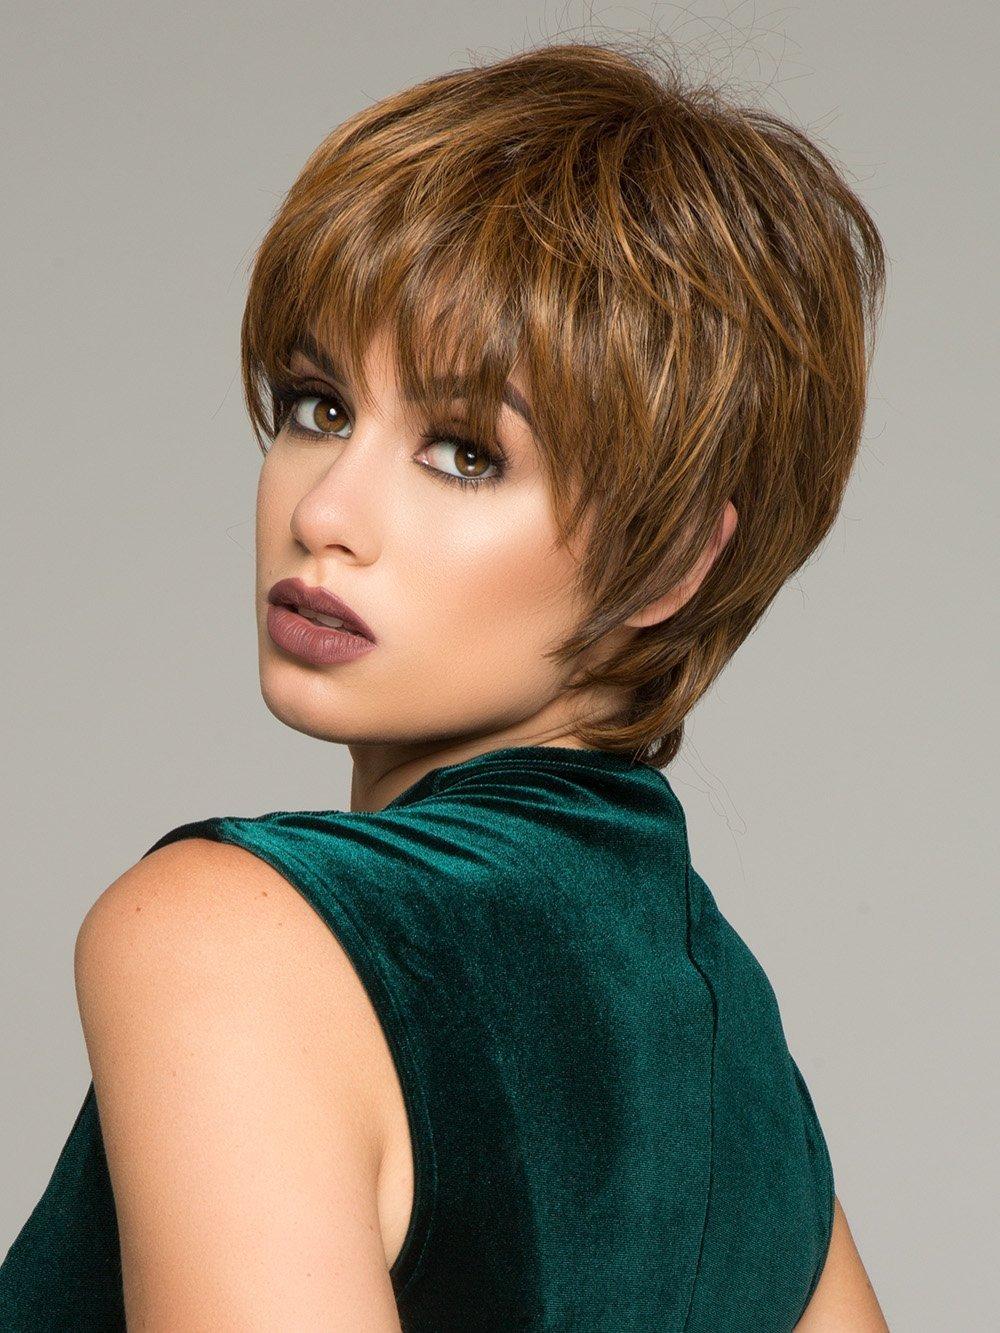 Enchant Short Shag Wig Color RL30/27 RUSTY AUBURN - Raquel Welch Wigs Tru2Life Heat Friendly Synthetic Women's Classic Cut Straight or Touseled Curls